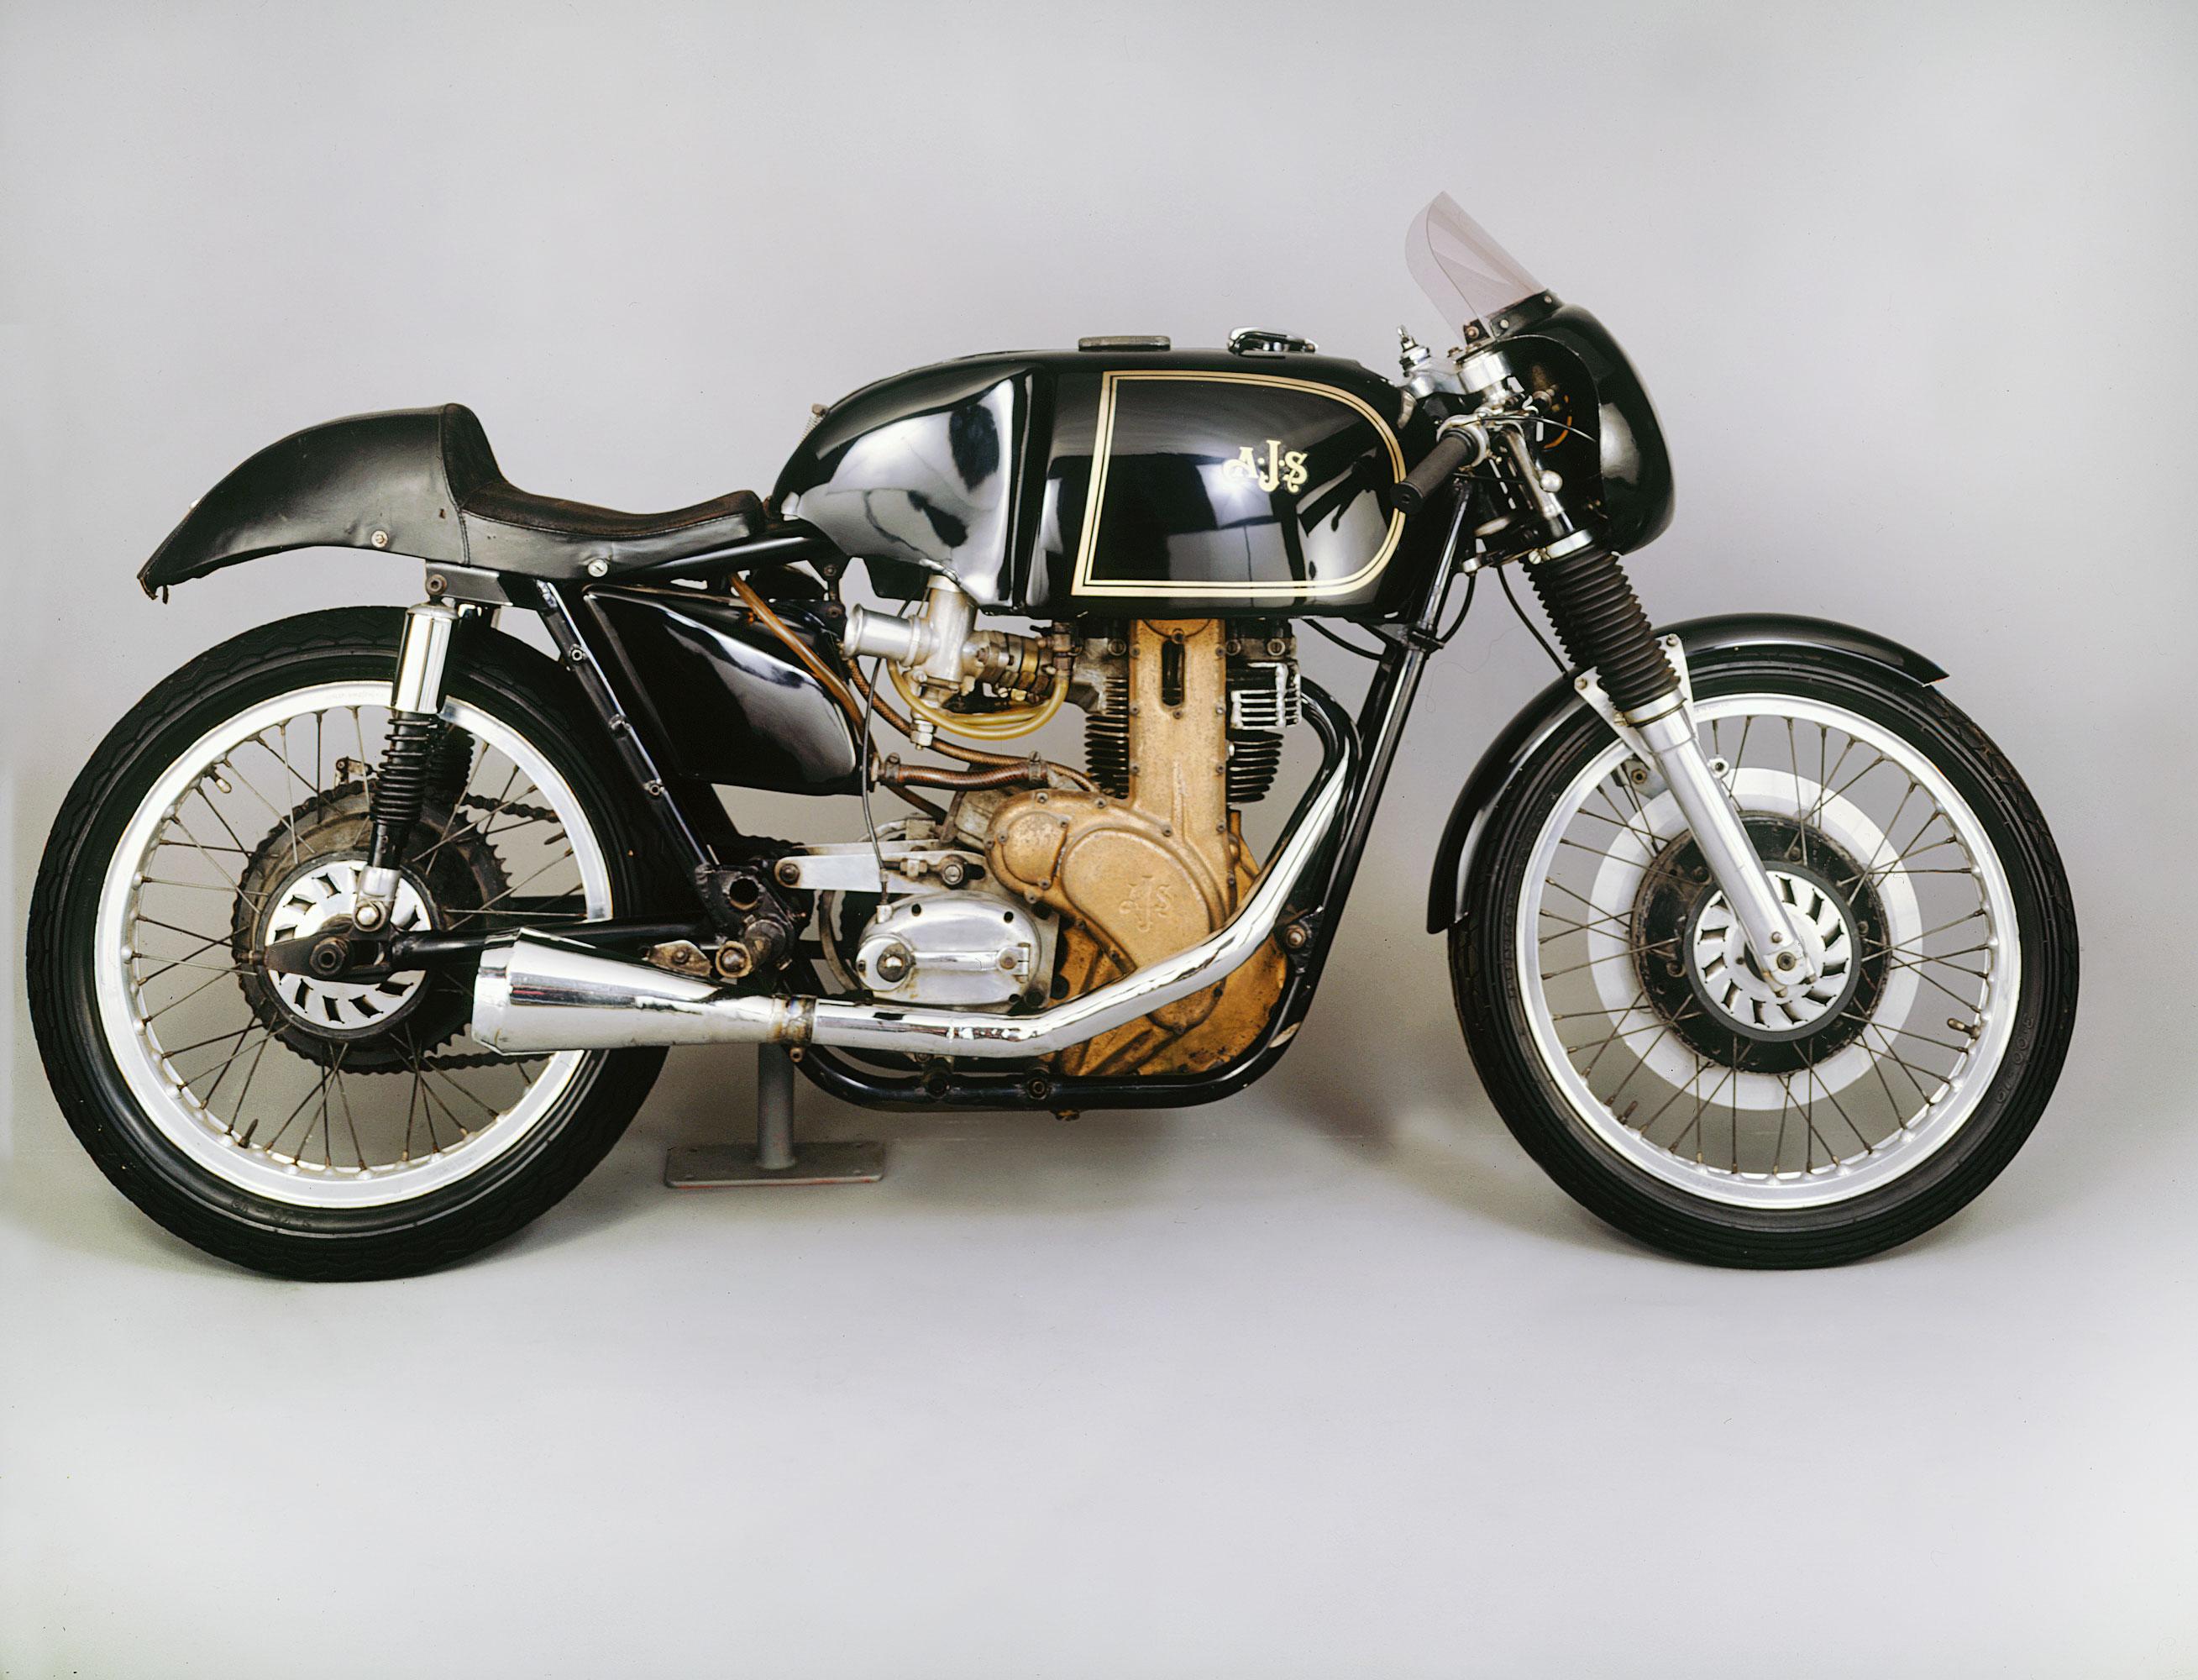 AJS 7R 1958